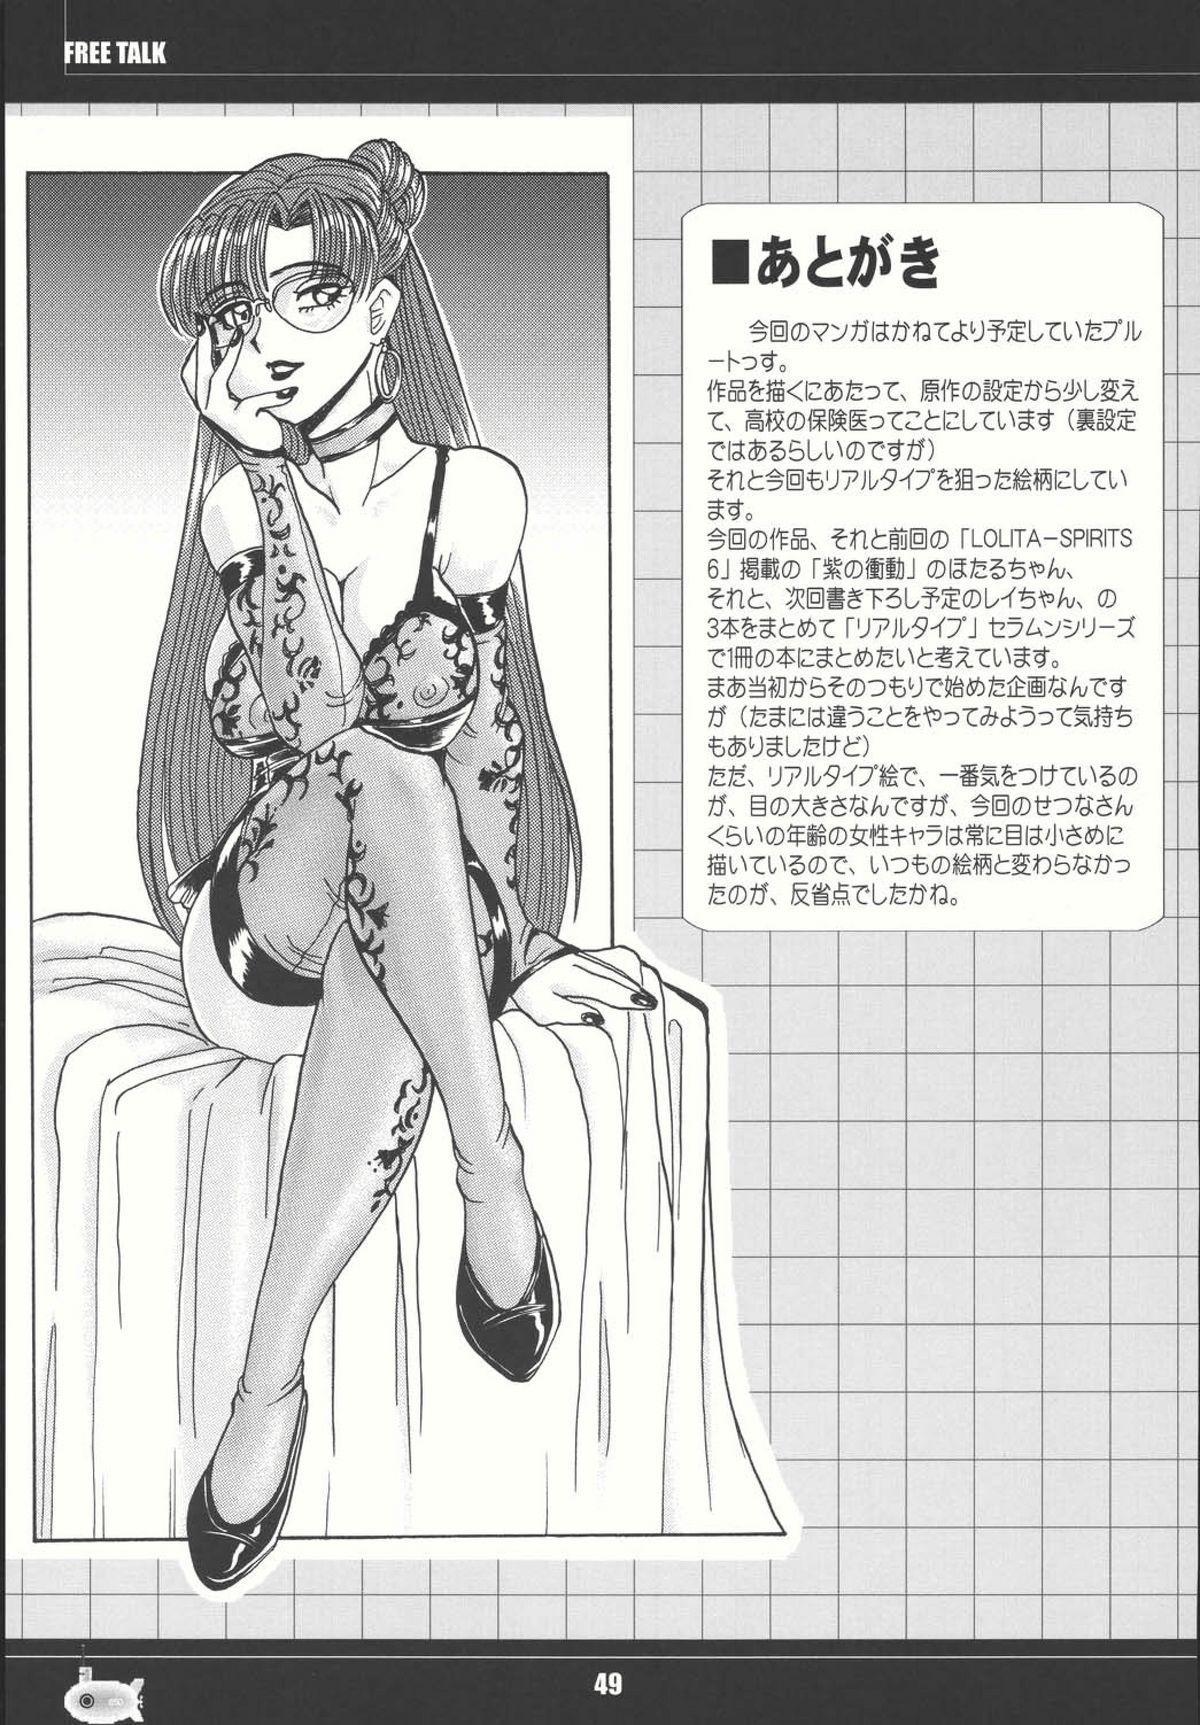 Sailor Spirits Super 47